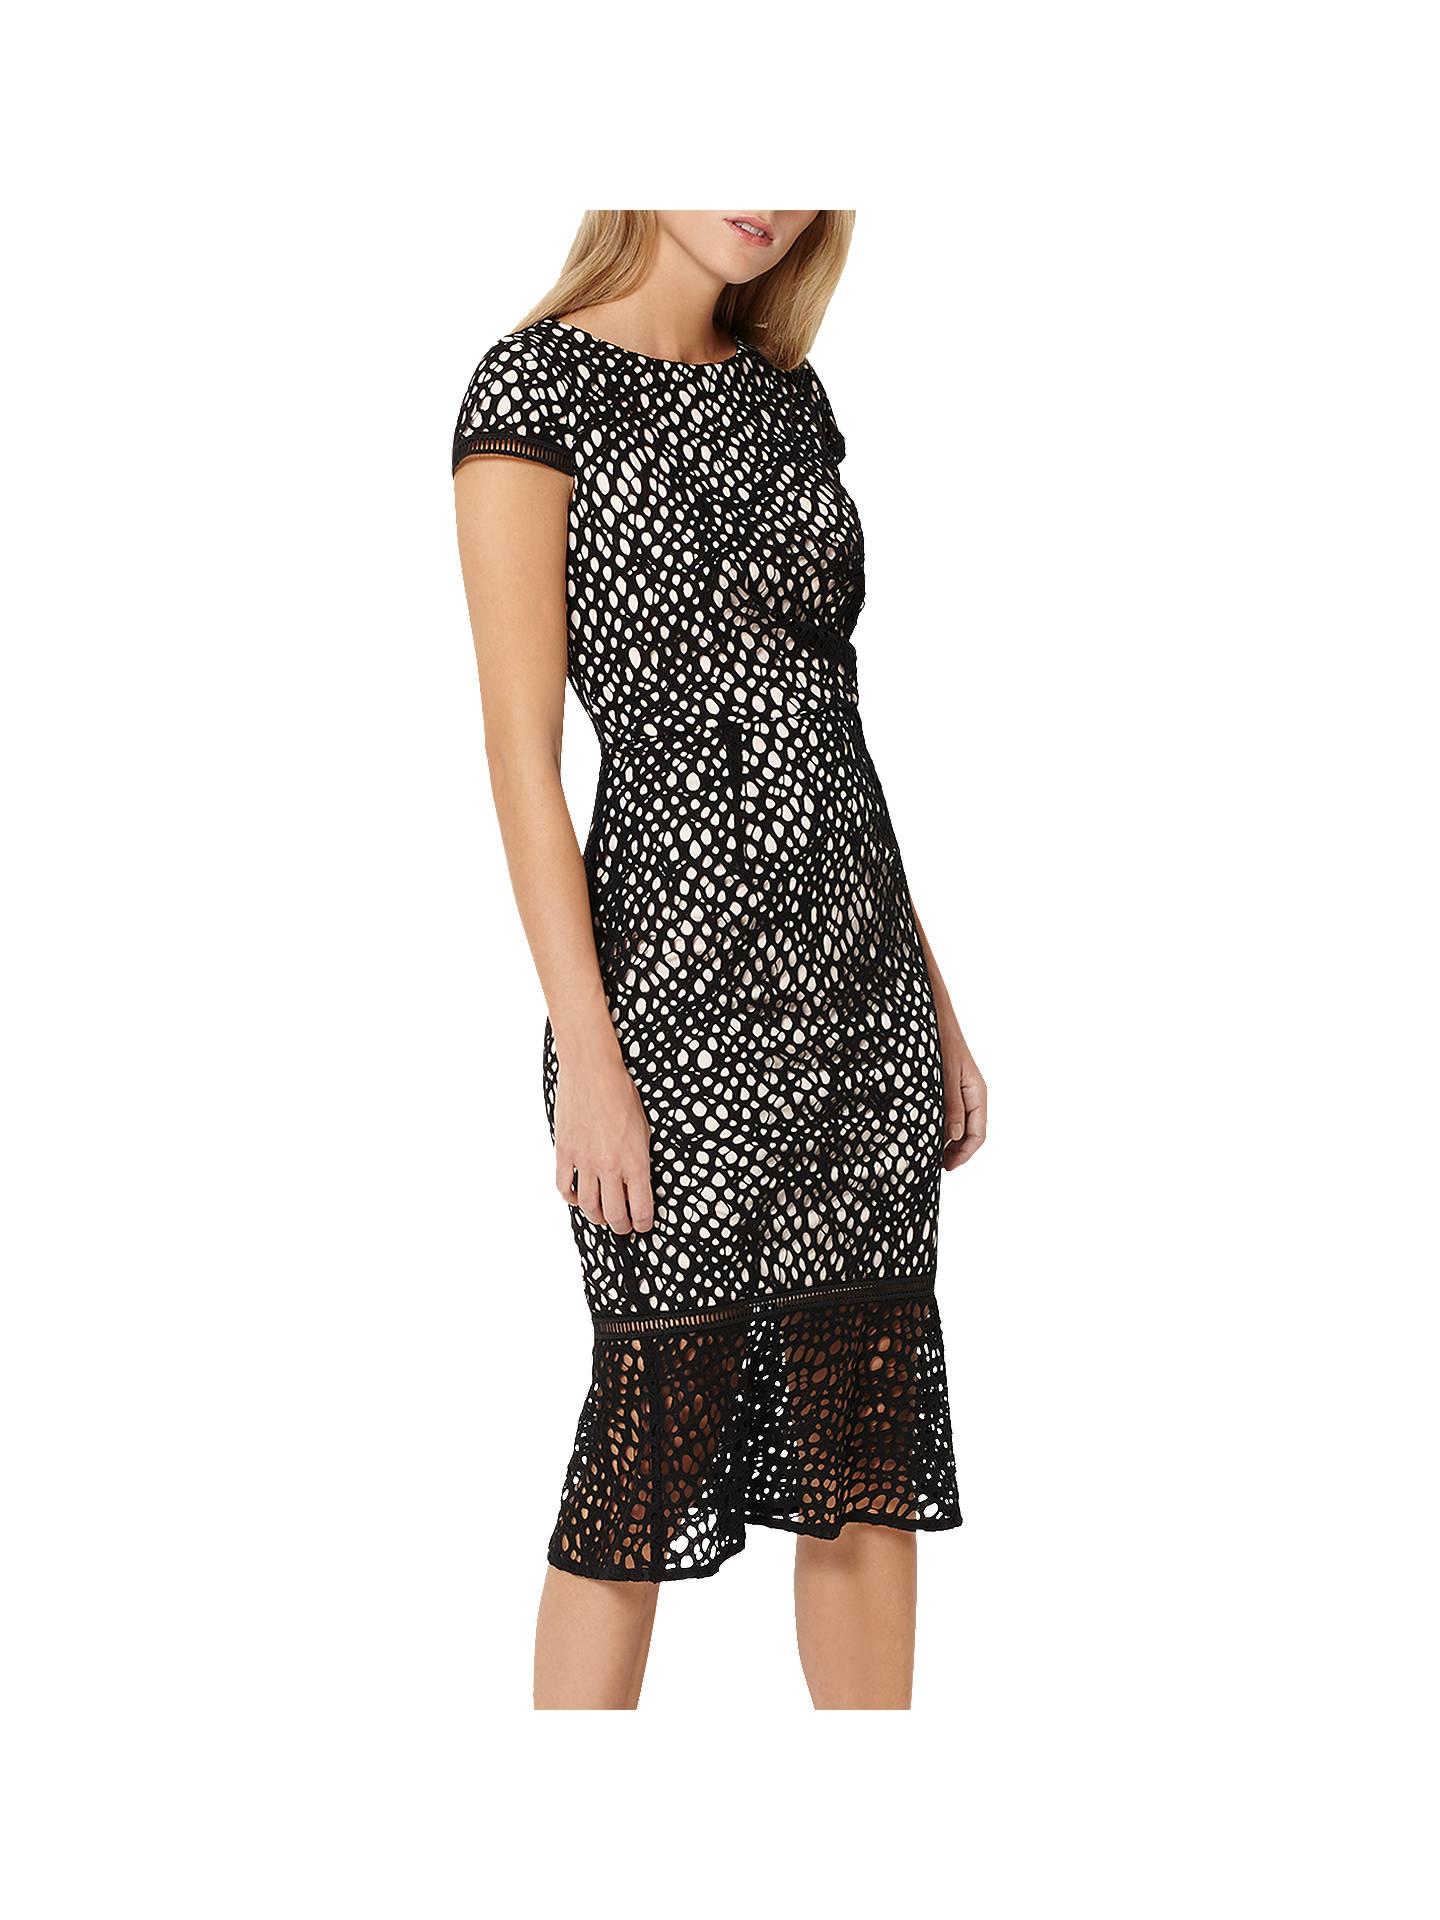 7403984b6f43 Buy Damsel in a Dress Caspian Lace Dress, Black/Blush, 8 Online at ...